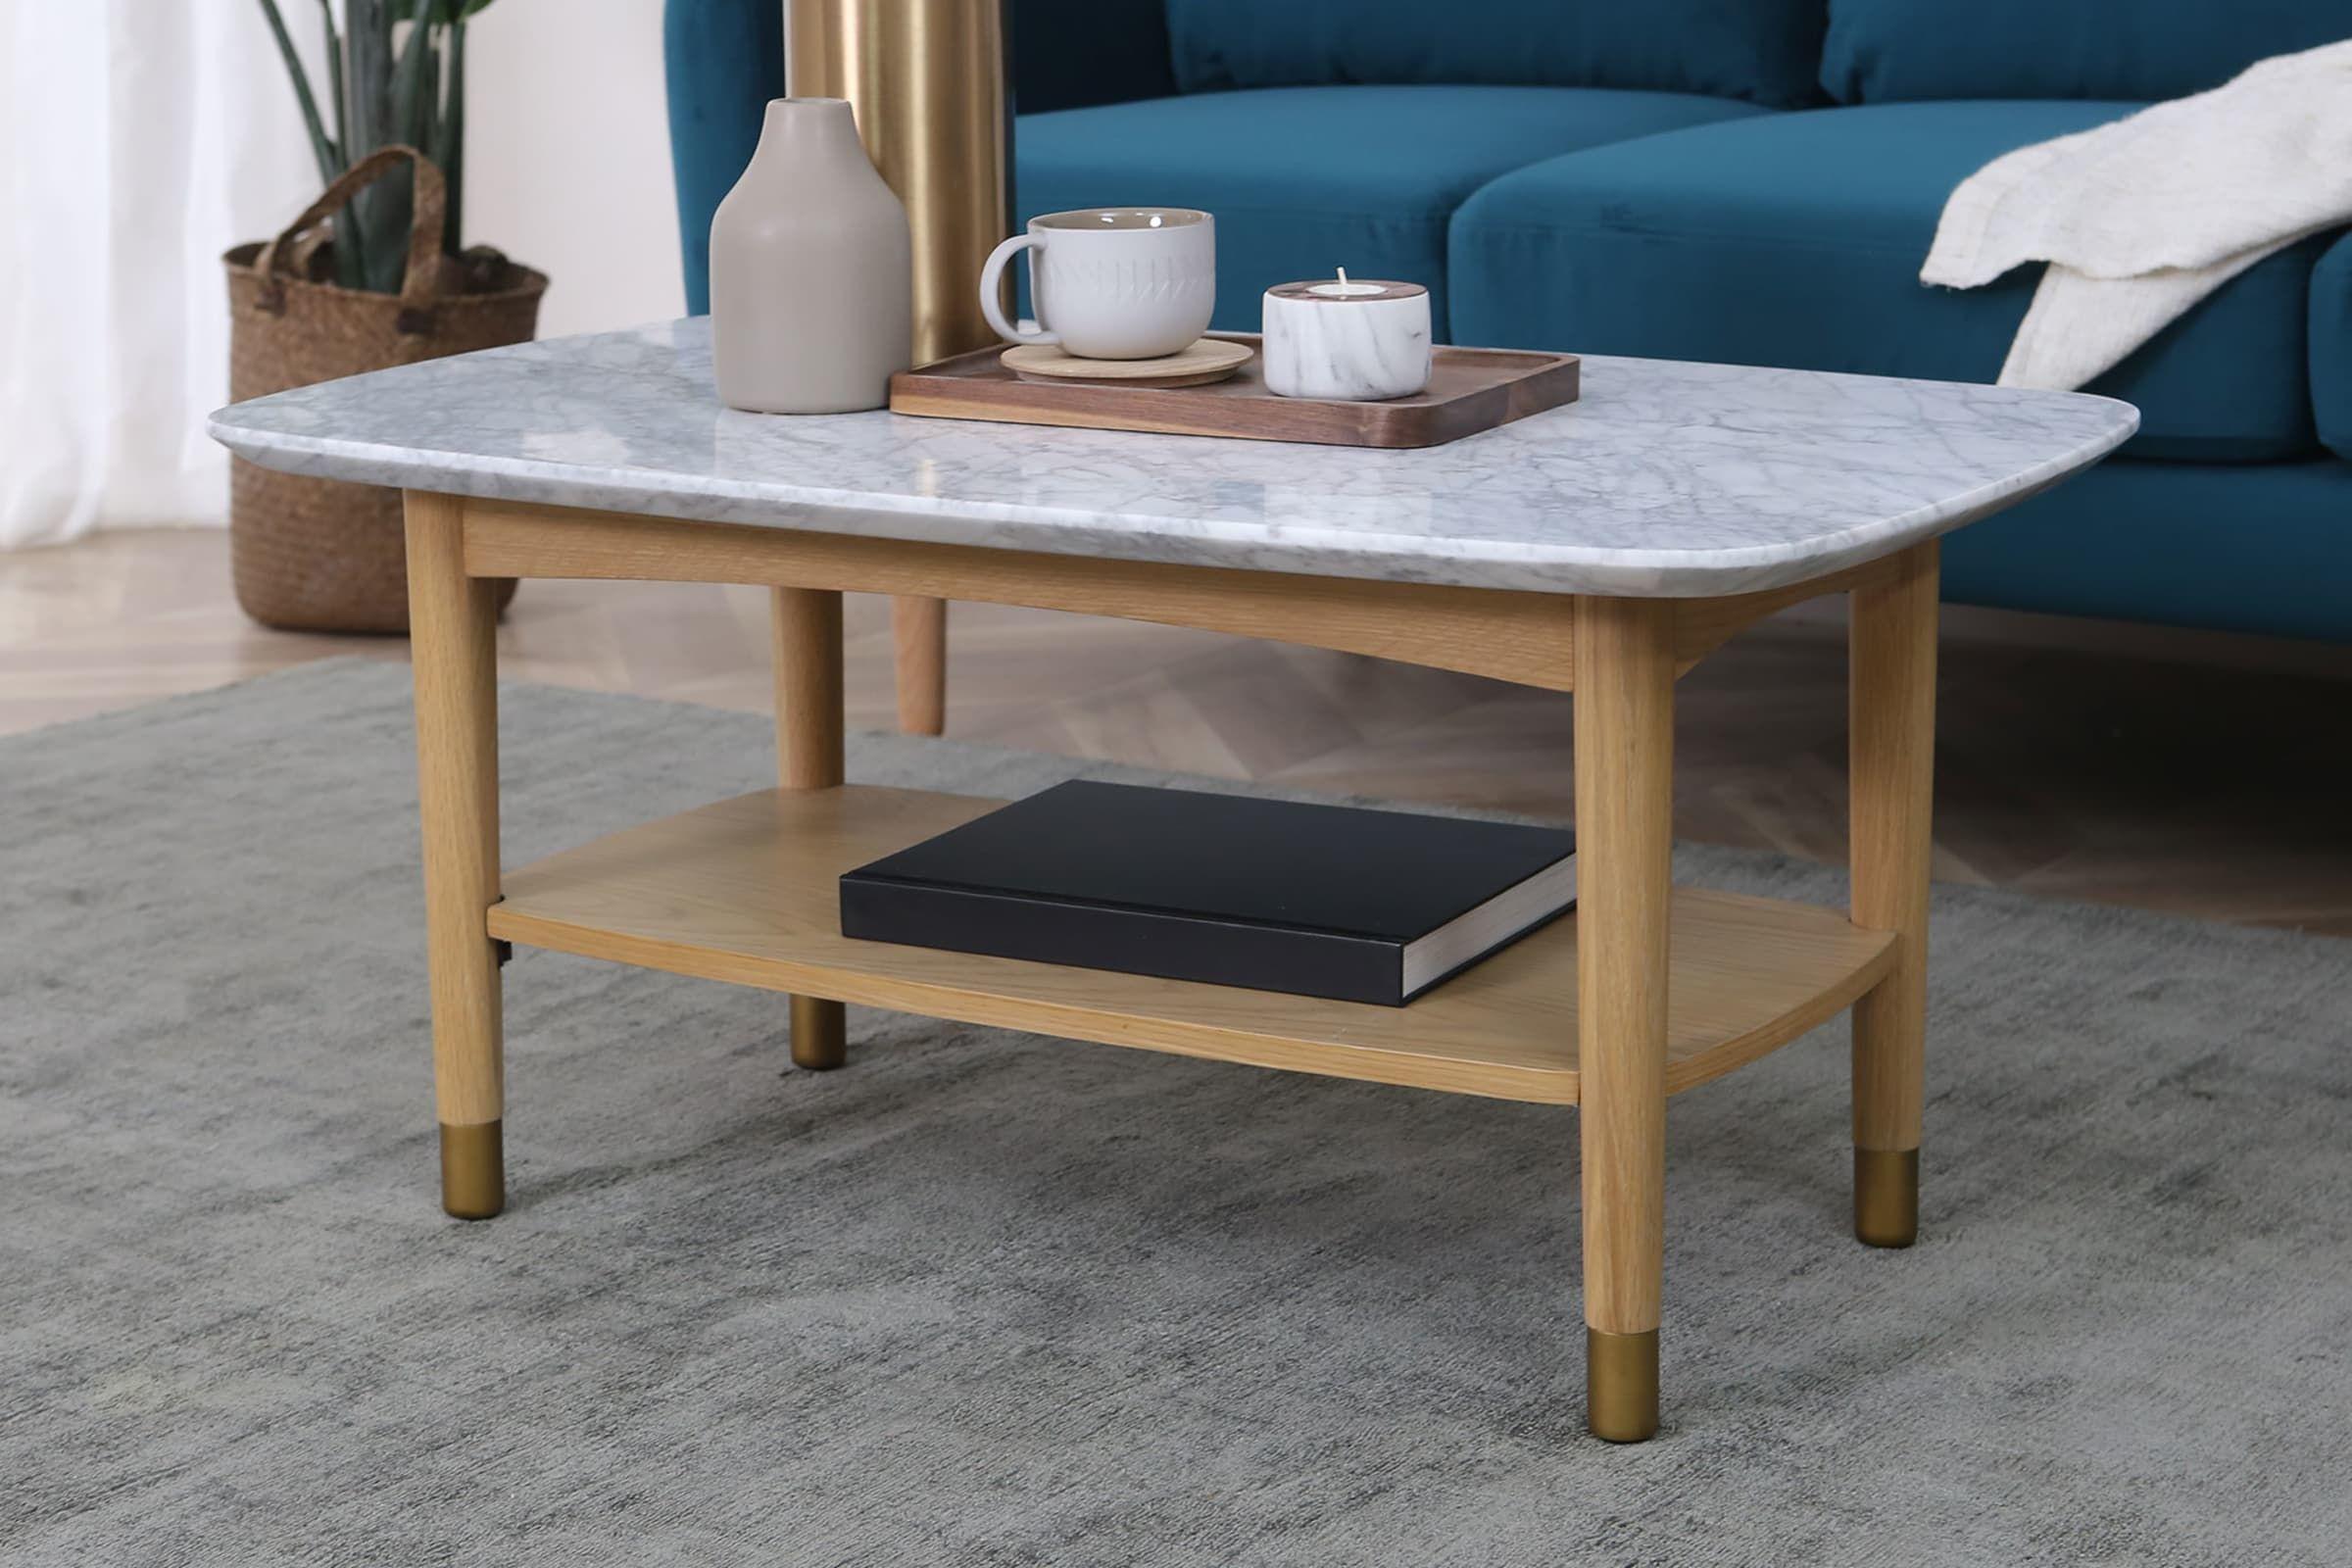 Contemporary Modern Luxury Furniture Perth Stores Contempo Coffee Table Furniture Coffee Table Design [ 1080 x 1920 Pixel ]